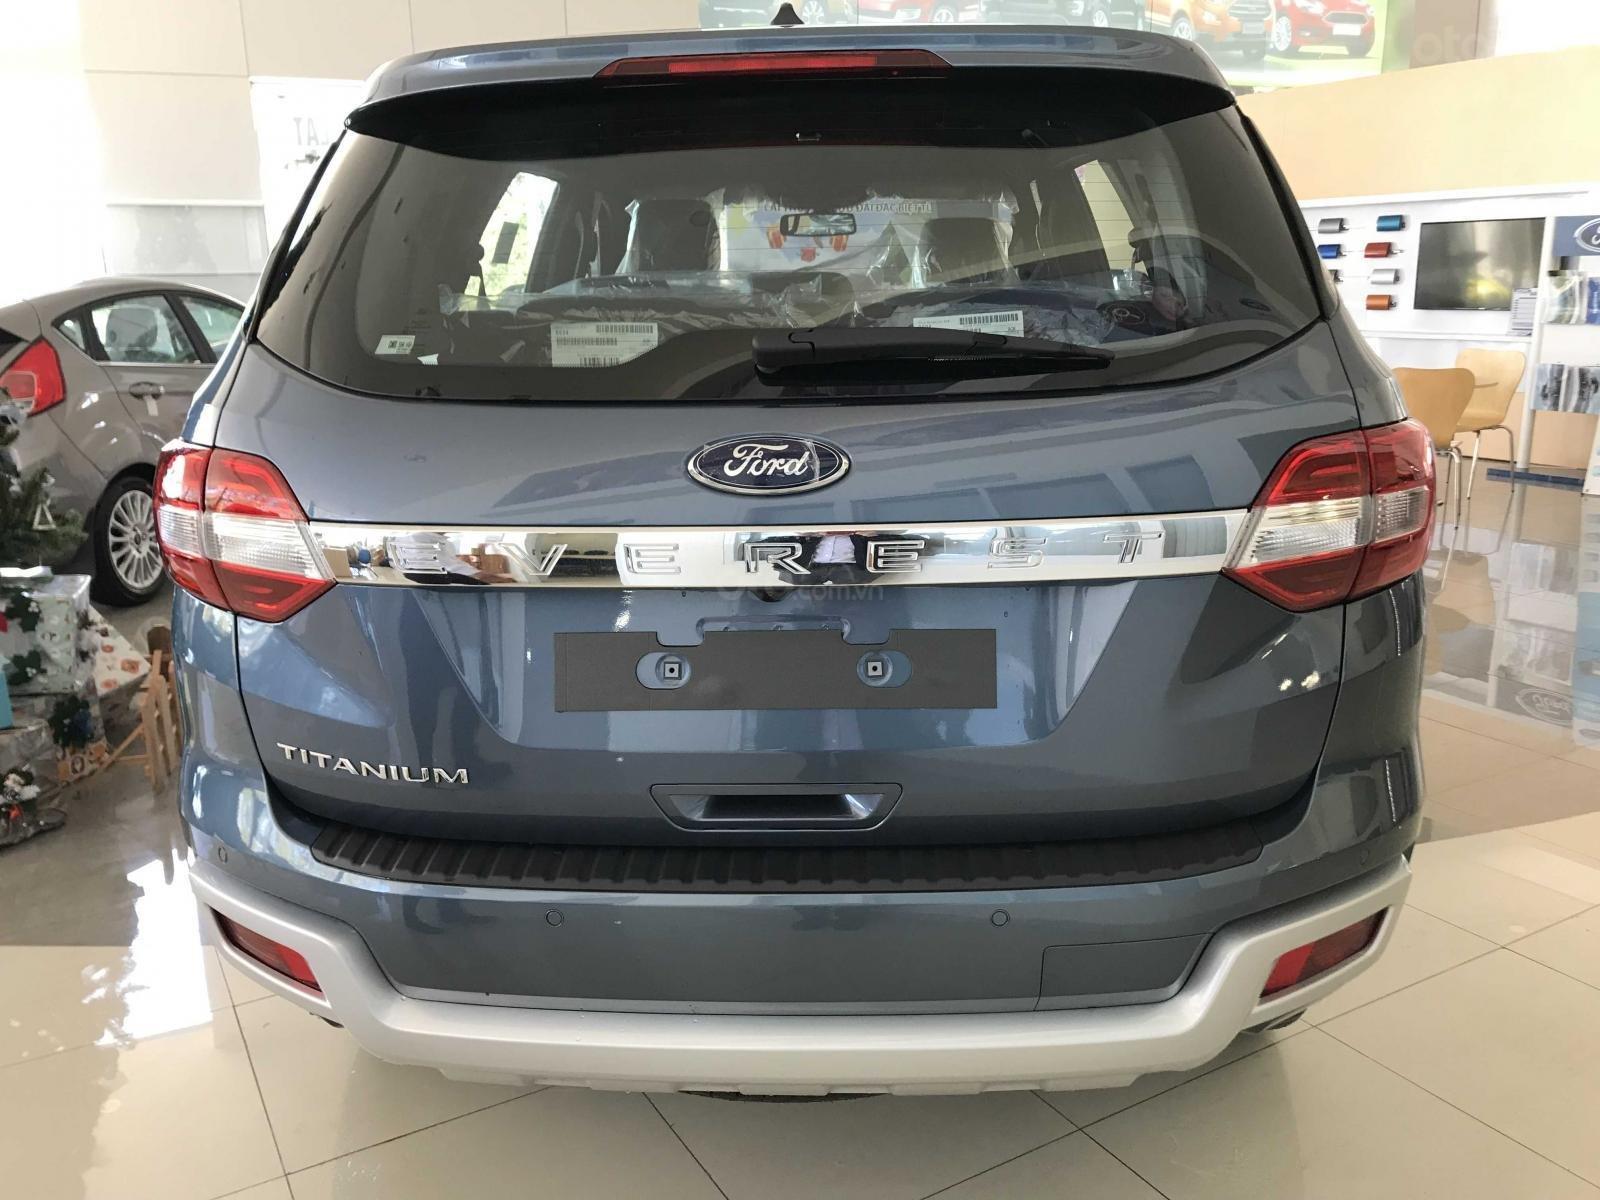 Ford Everest Titanium 2019 nhập khẩu giá tốt nhất (3)